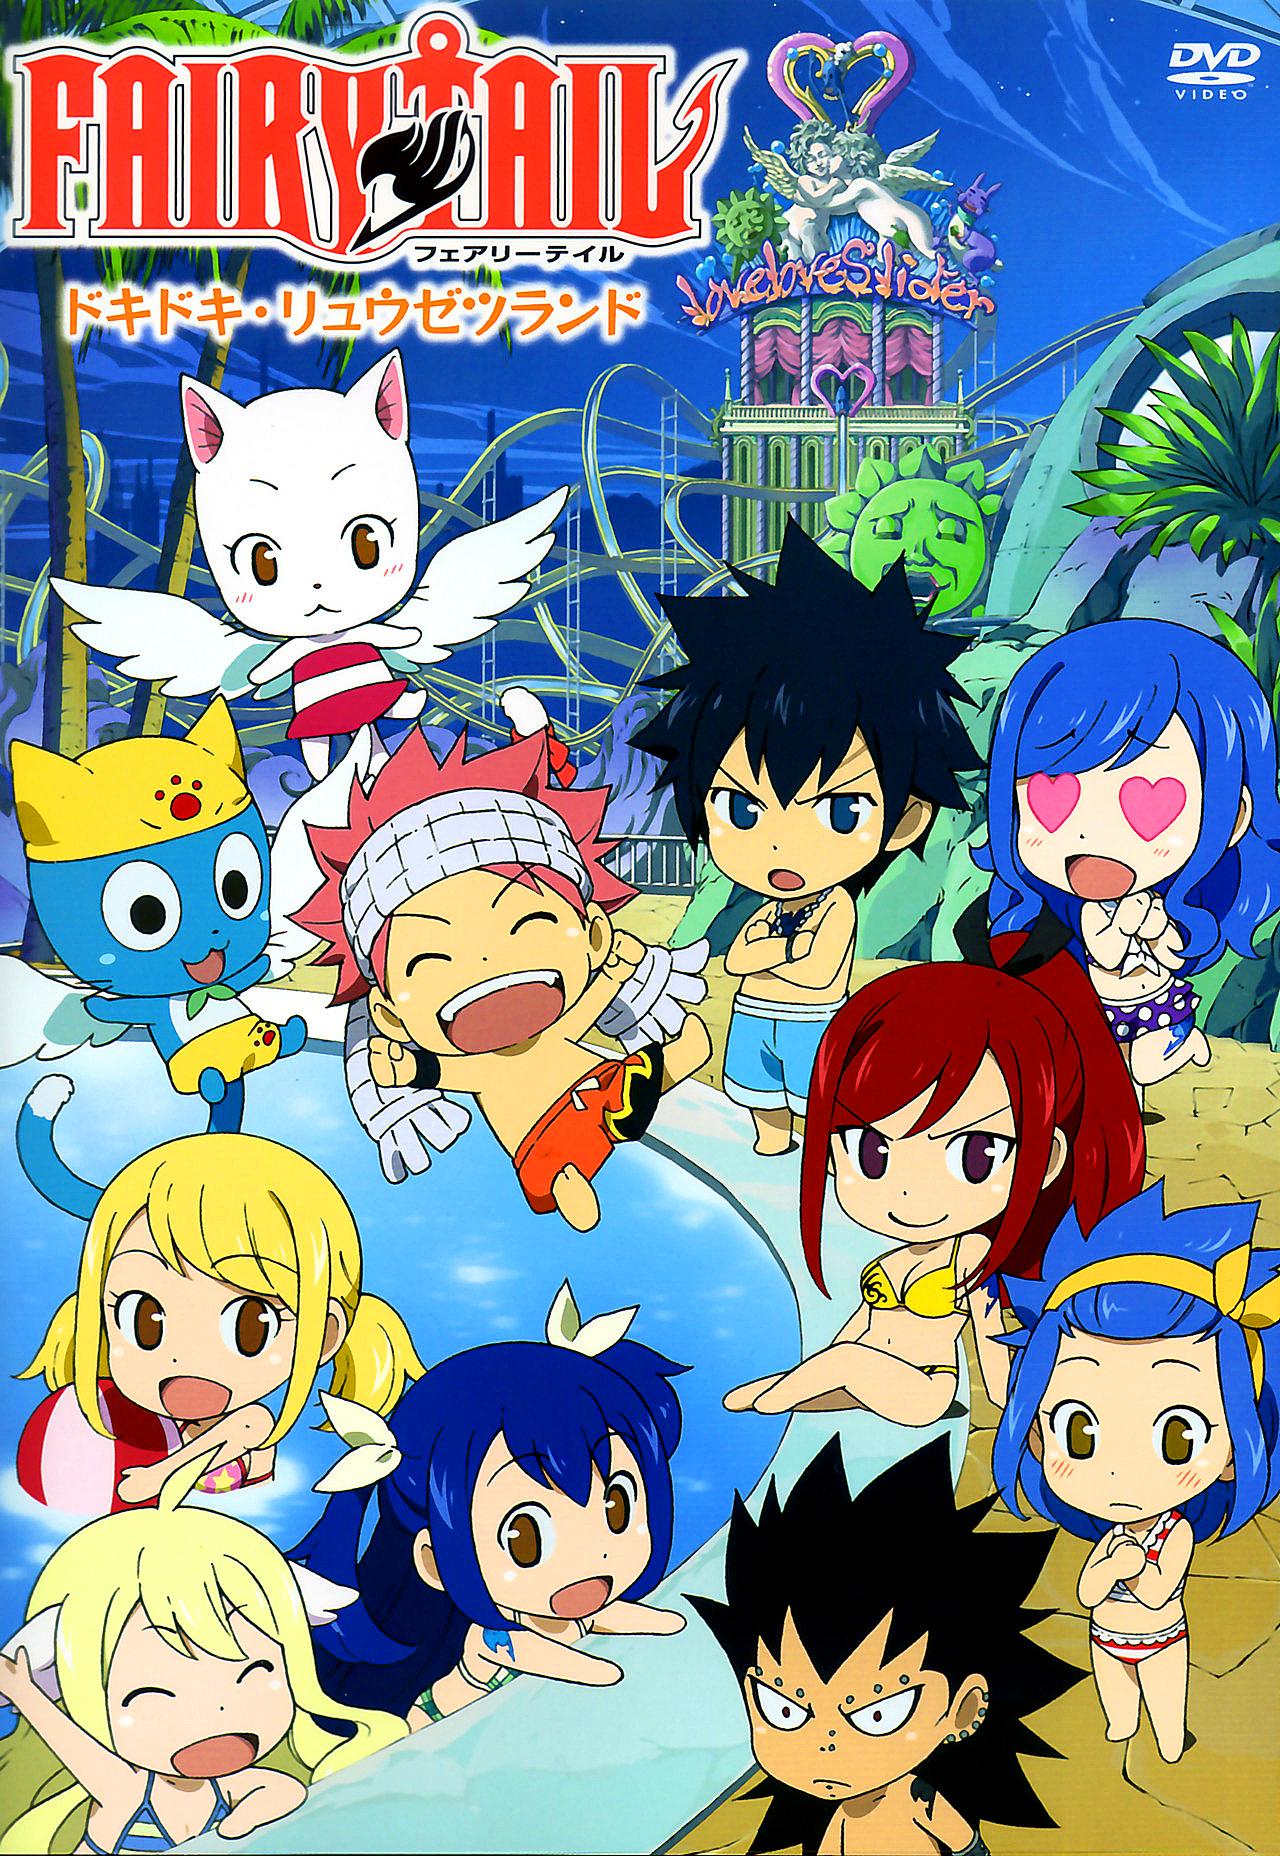 Episodes | Fairy Tail Wiki | FANDOM powered by Wikia